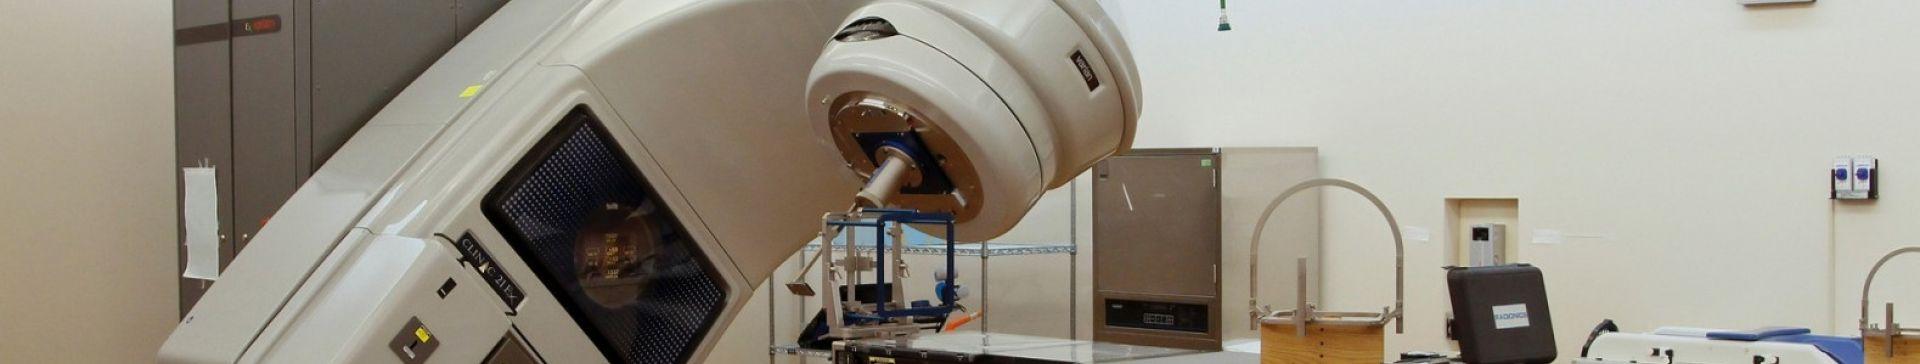 national-cancer-institute-mBrfAiw_CZA-unsplash min_20201223141203.jpg